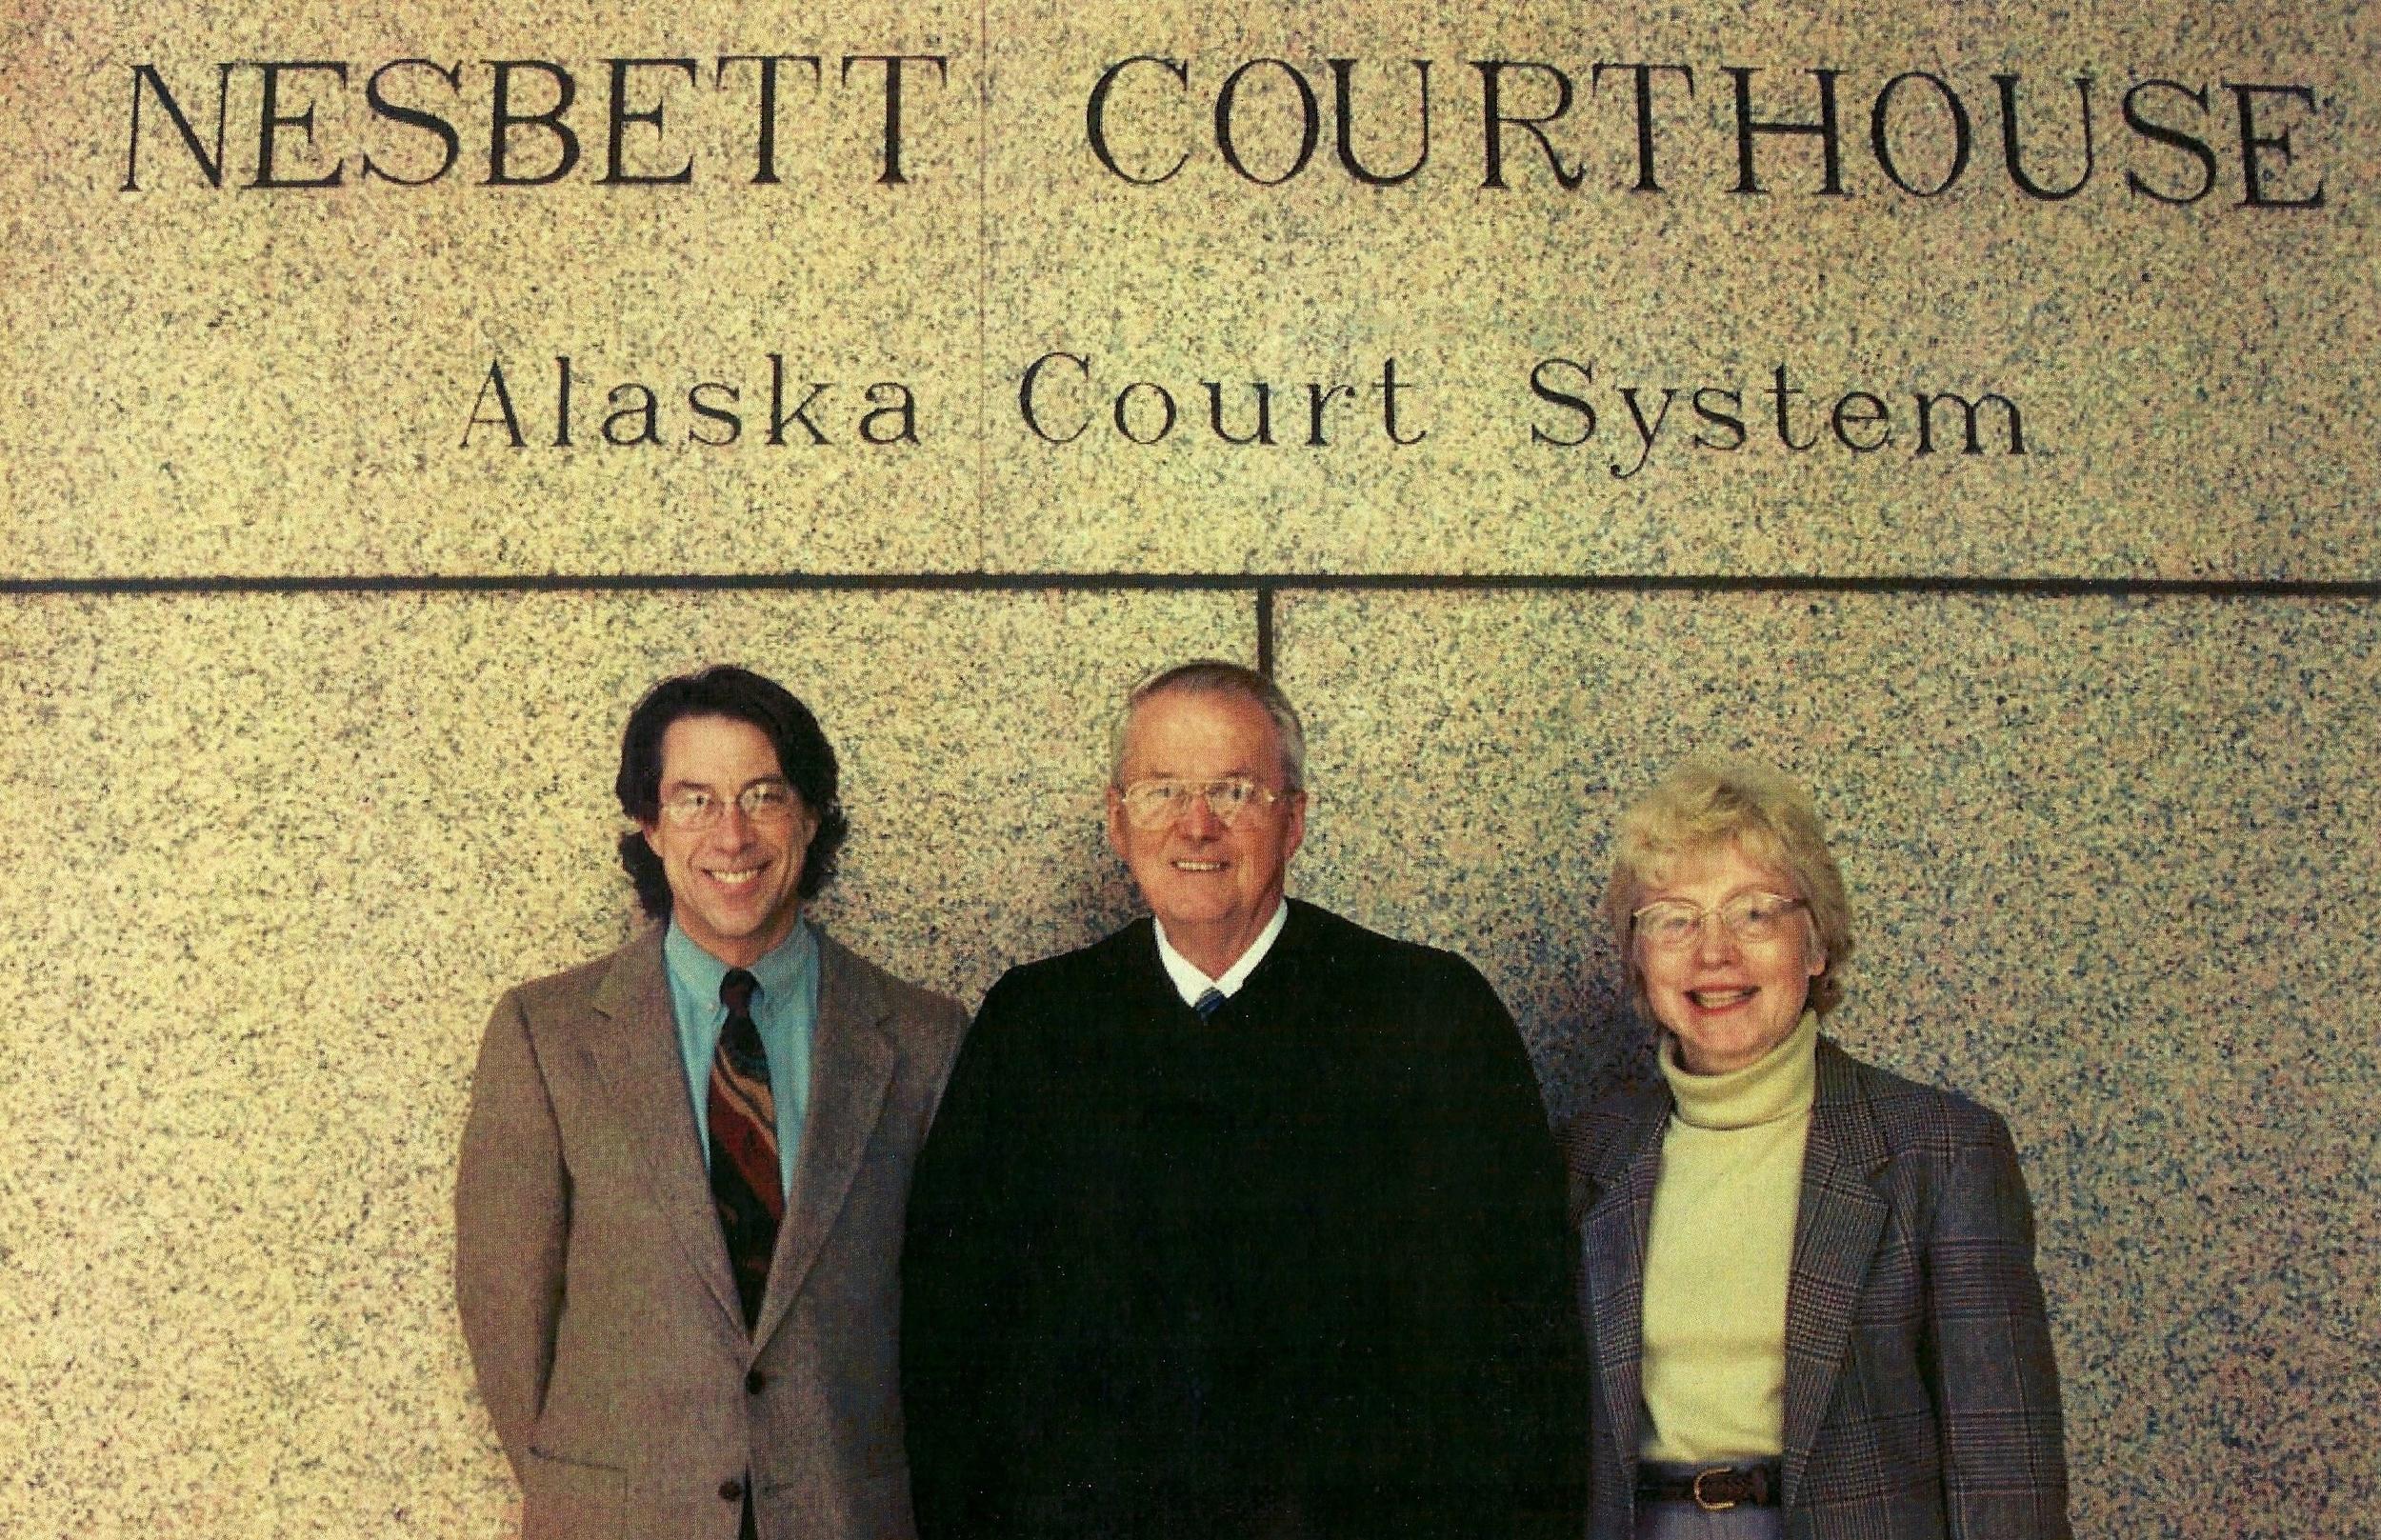 The three founders of the Anchorage Municipal Wellness Court, John Richard, Judge Jim Wanamaker and Janet McCabe.